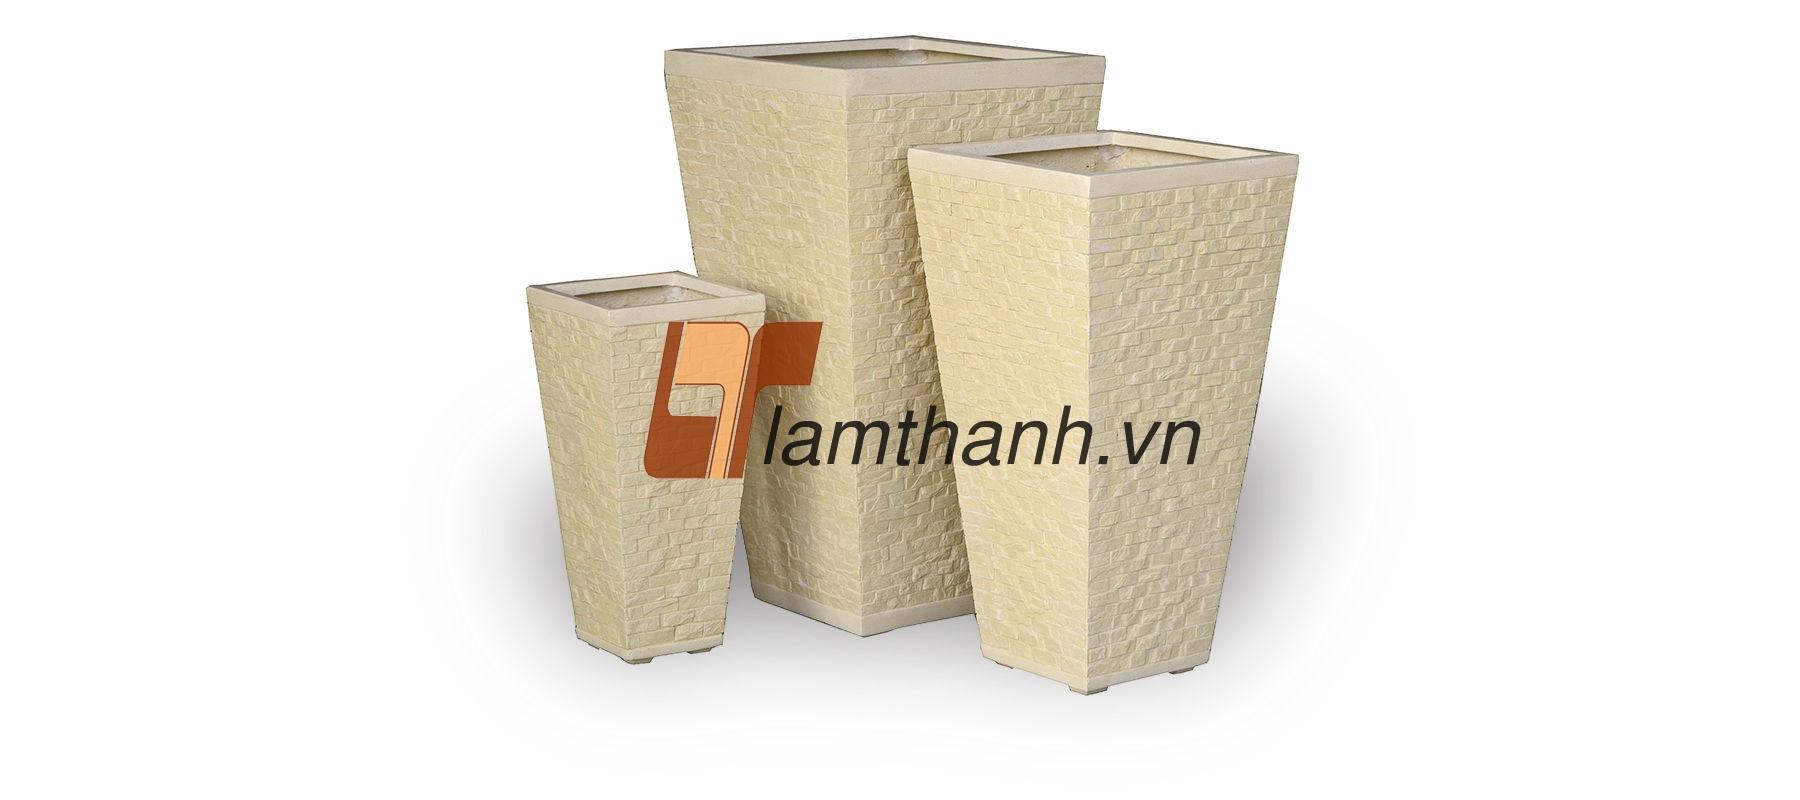 vietnam polystone, outdoor glazed 03